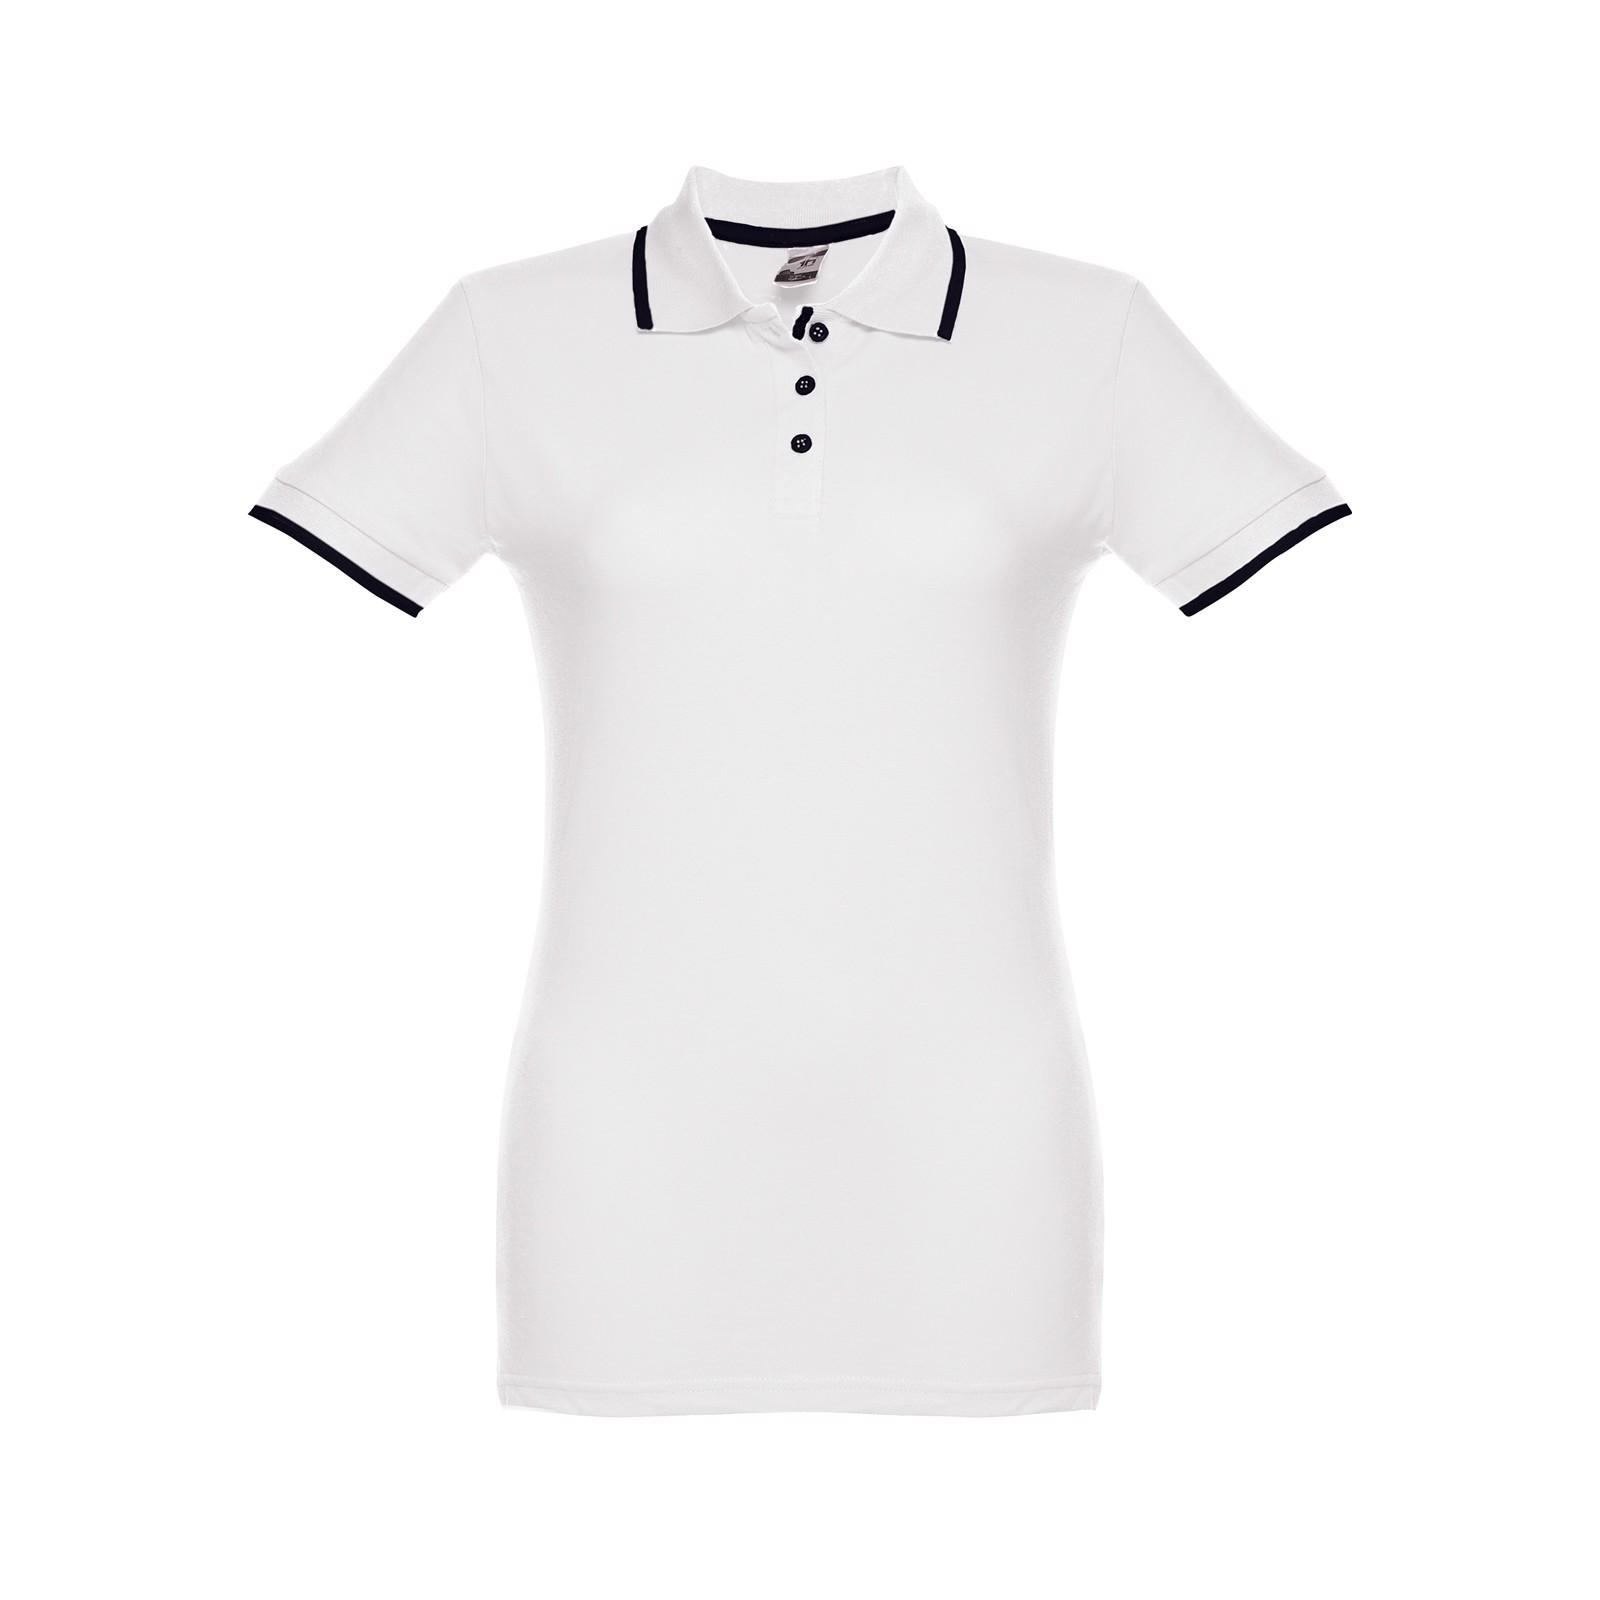 ROME WOMEN. Γυναικεία πόλο μπλούζα slimfit - Λευκό / S